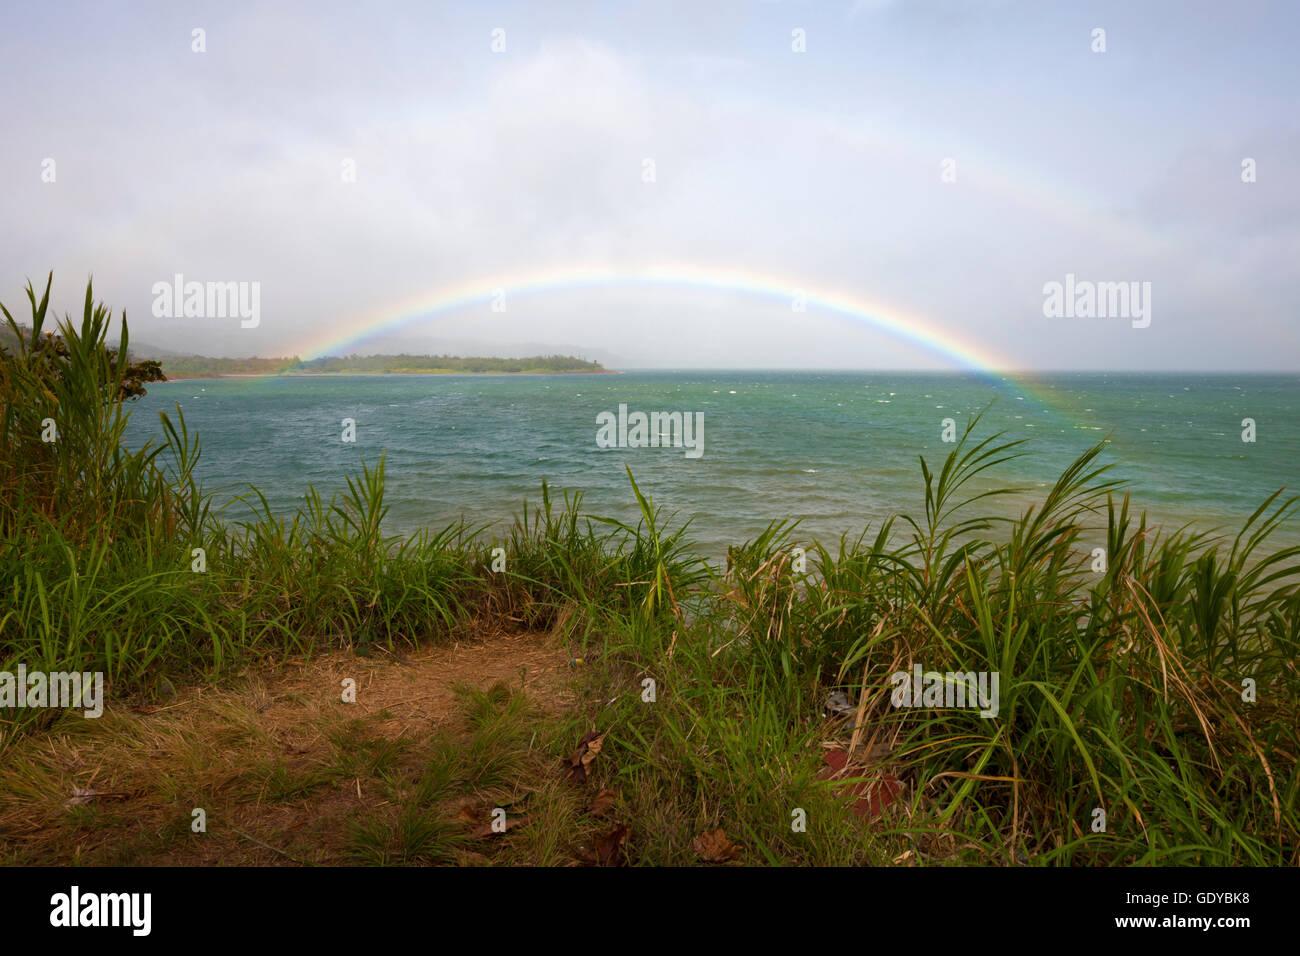 Rainbow over Lake Arenal, Alajuela Province, Costa Rica - Stock Image